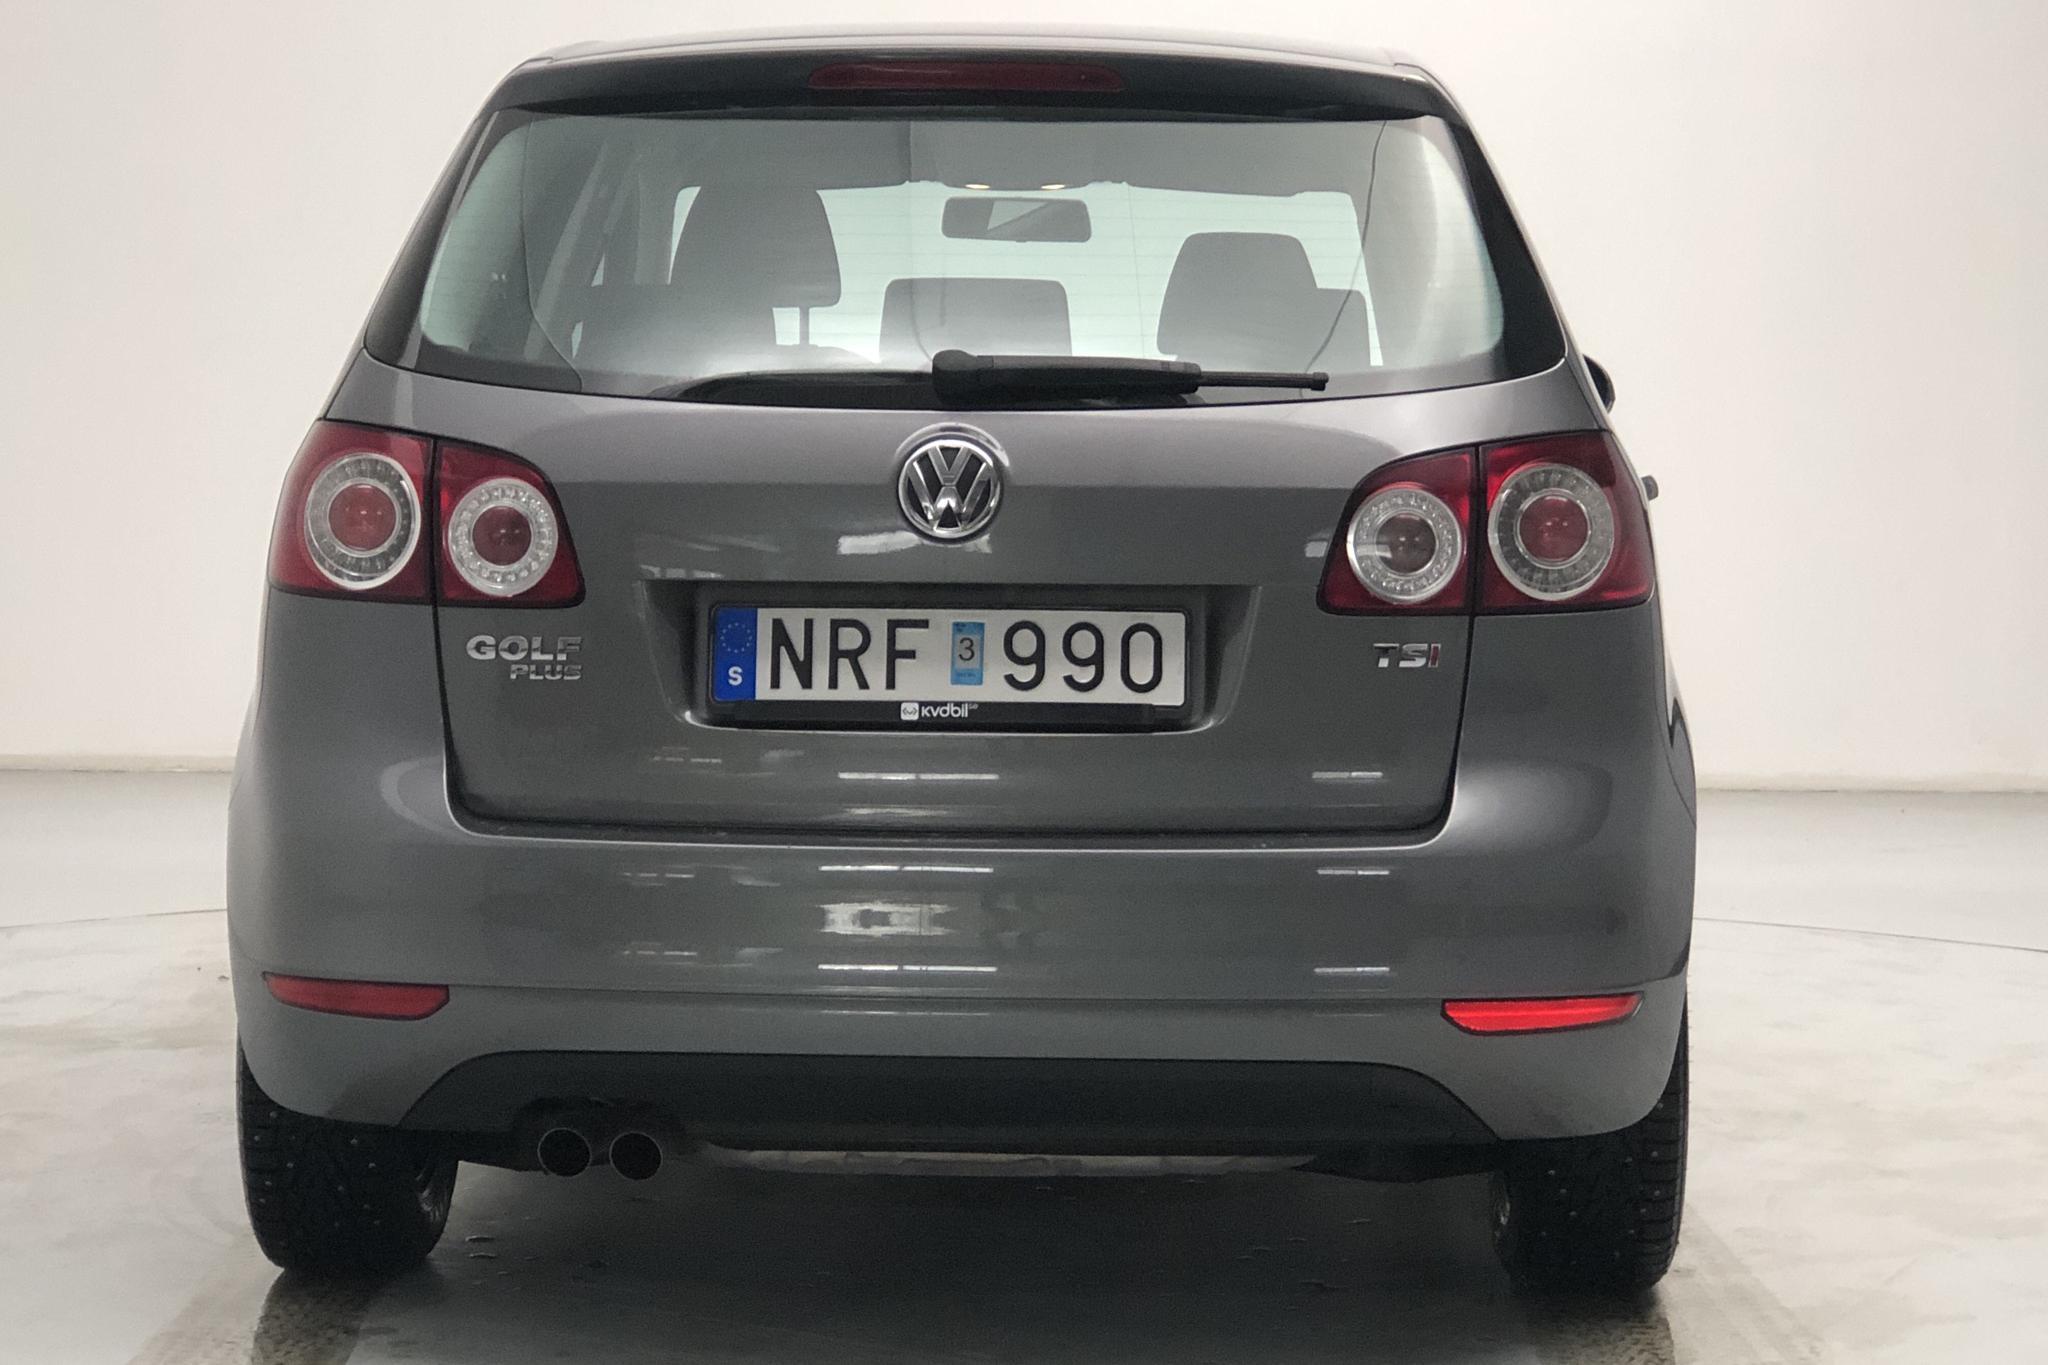 VW Golf VI 1.4 TSI Plus (122hk) - 6 921 mil - Manuell - grå - 2009